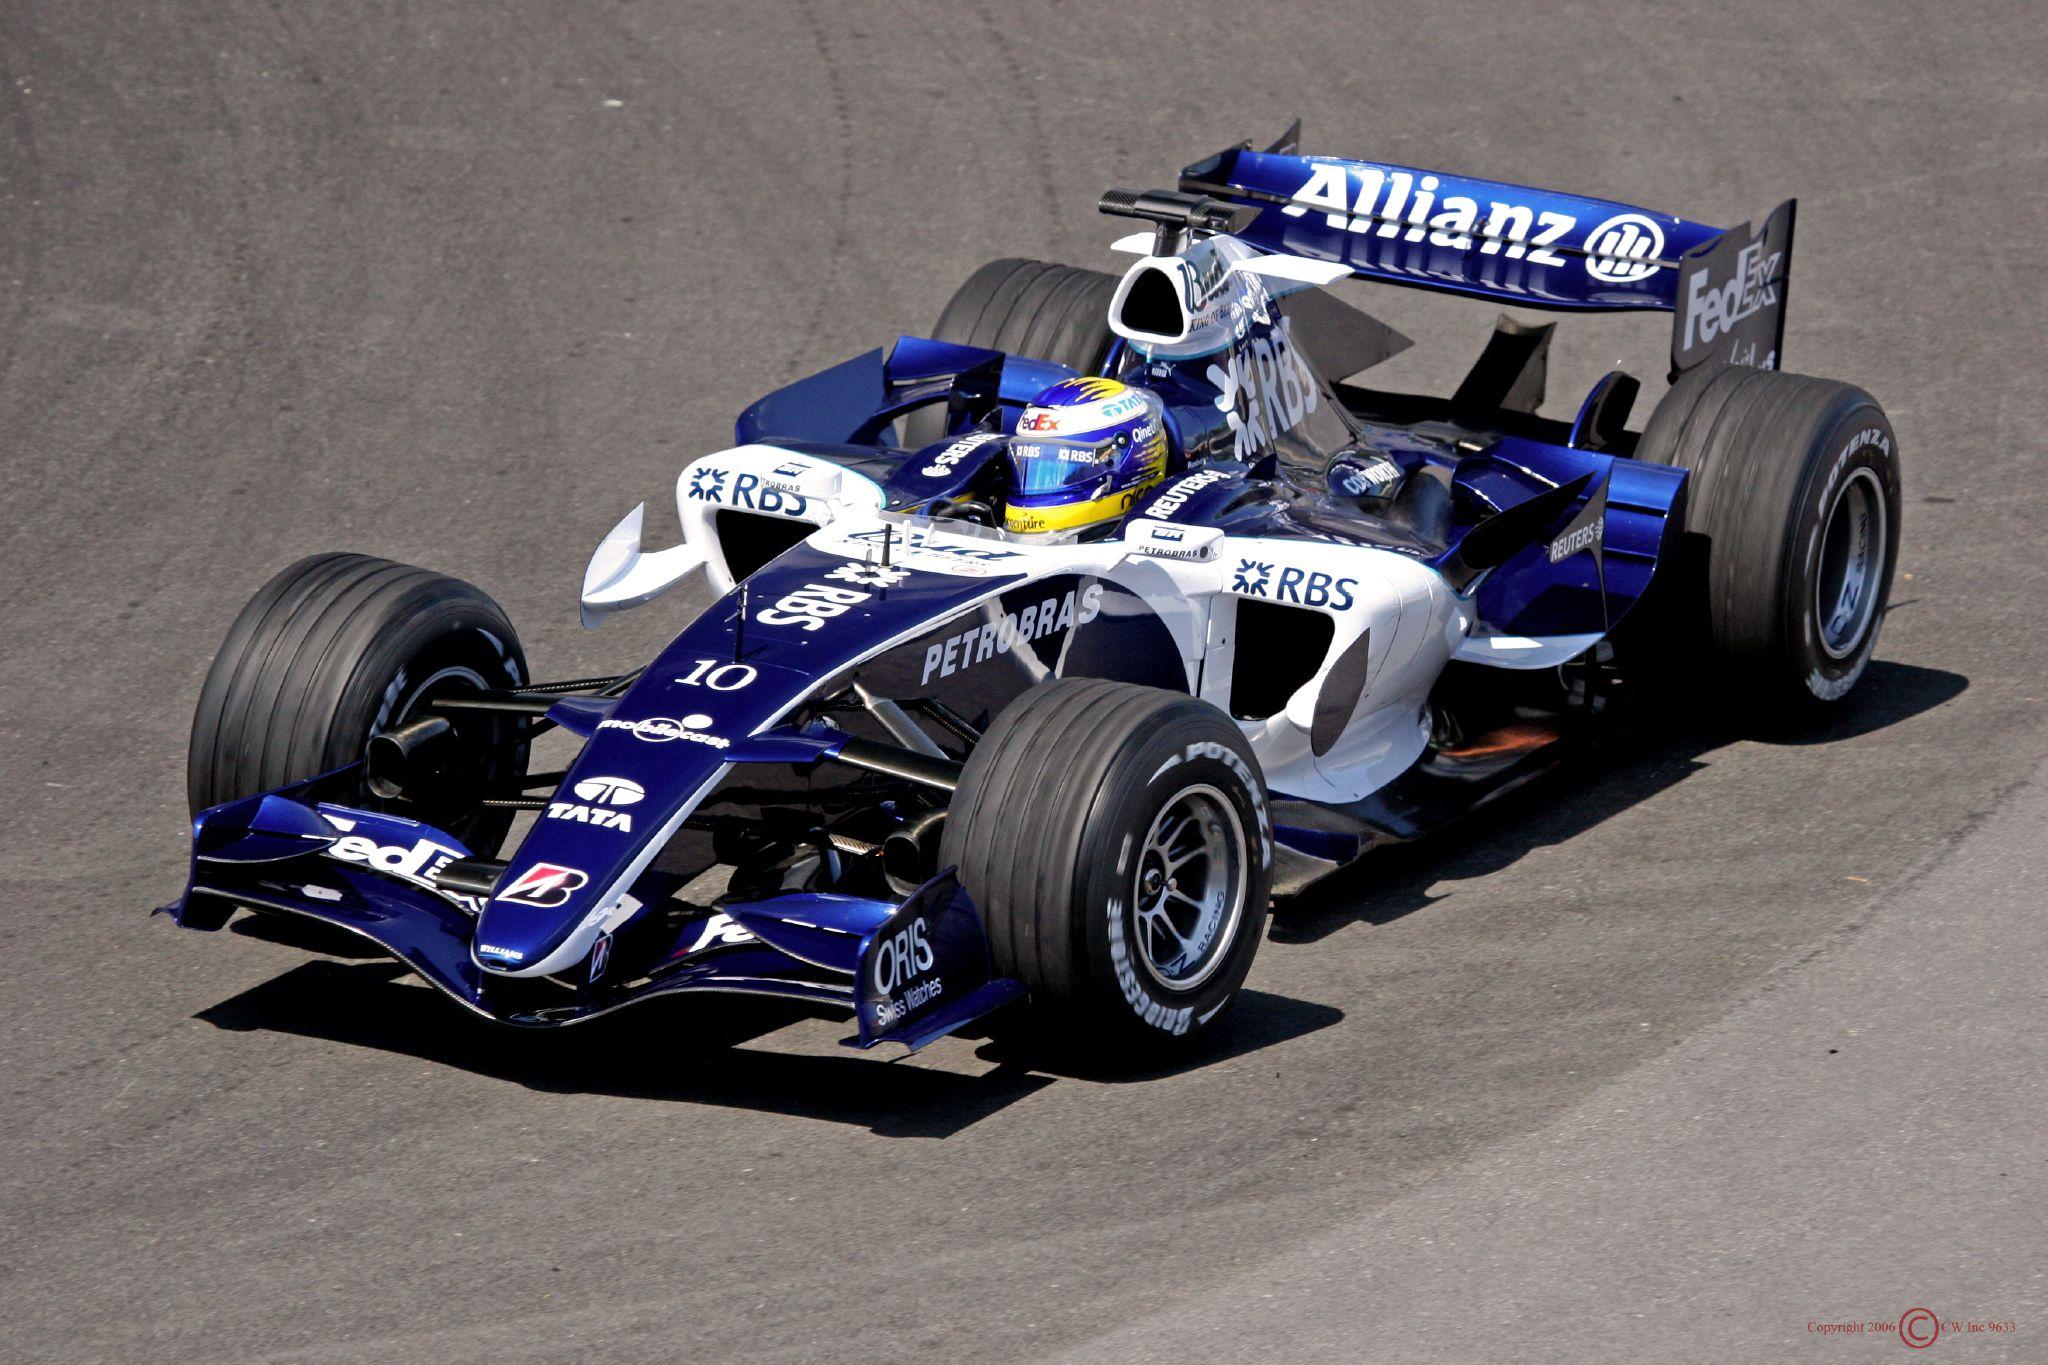 Nico_Rosberg_2006_Canada_2.jpg